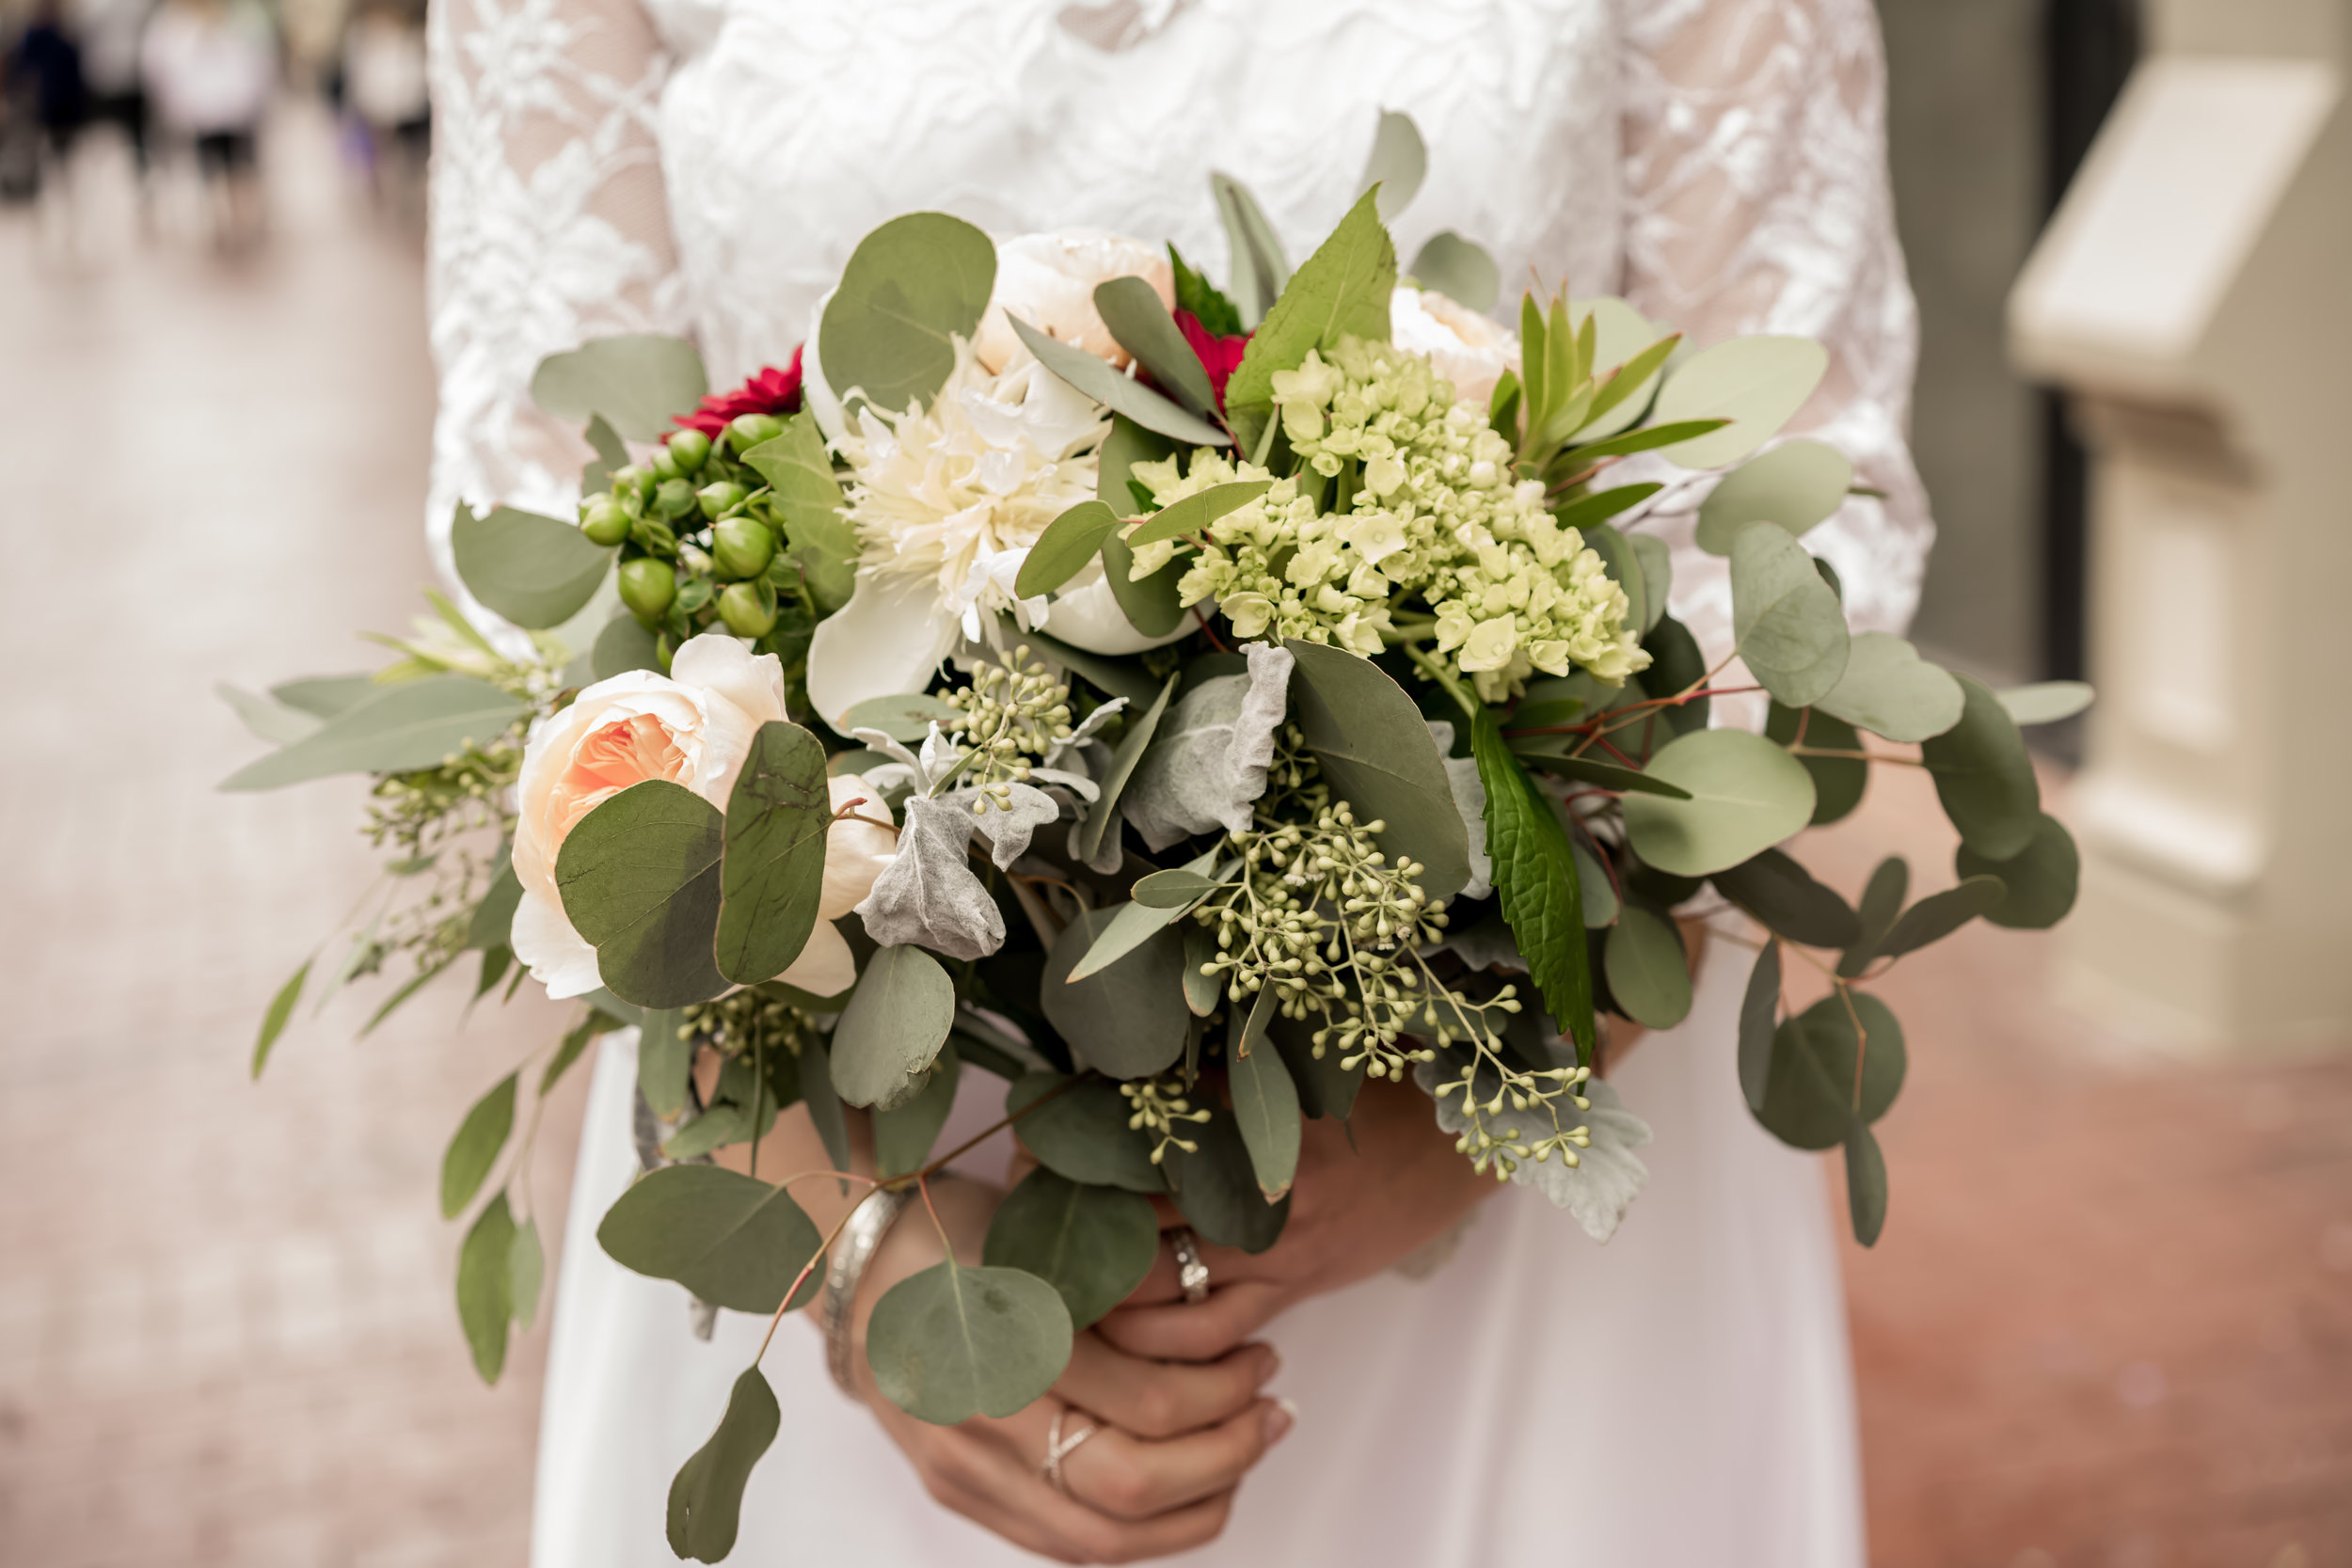 Wedding bouquet field photo louisville photographer